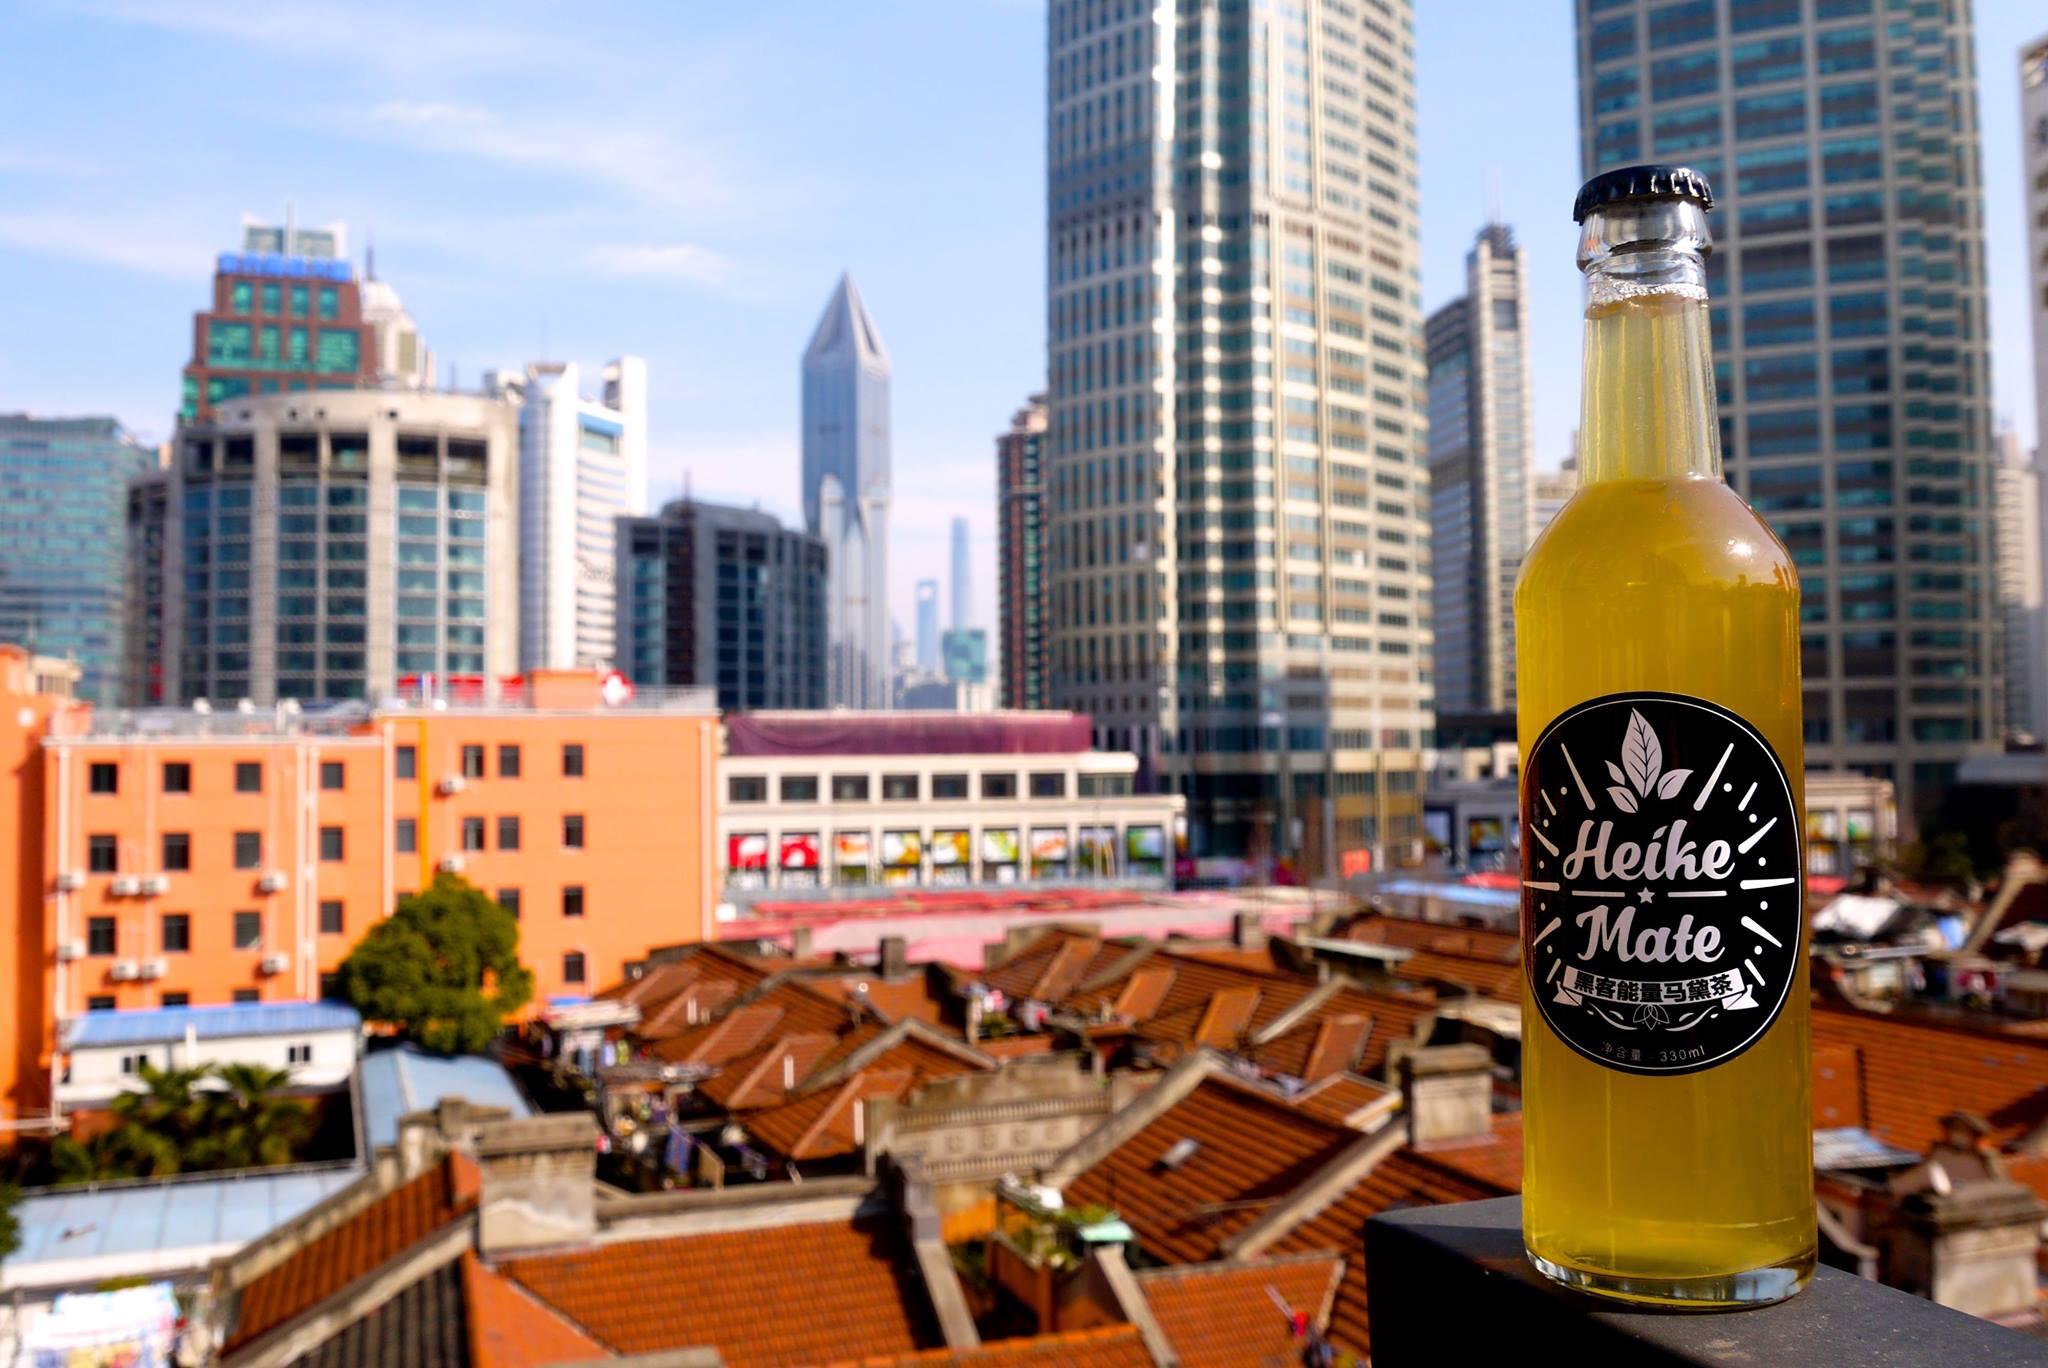 http://zapfler-craft-beer.com/wp-content/uploads/2018/08/Heike-Mate-1.jpg